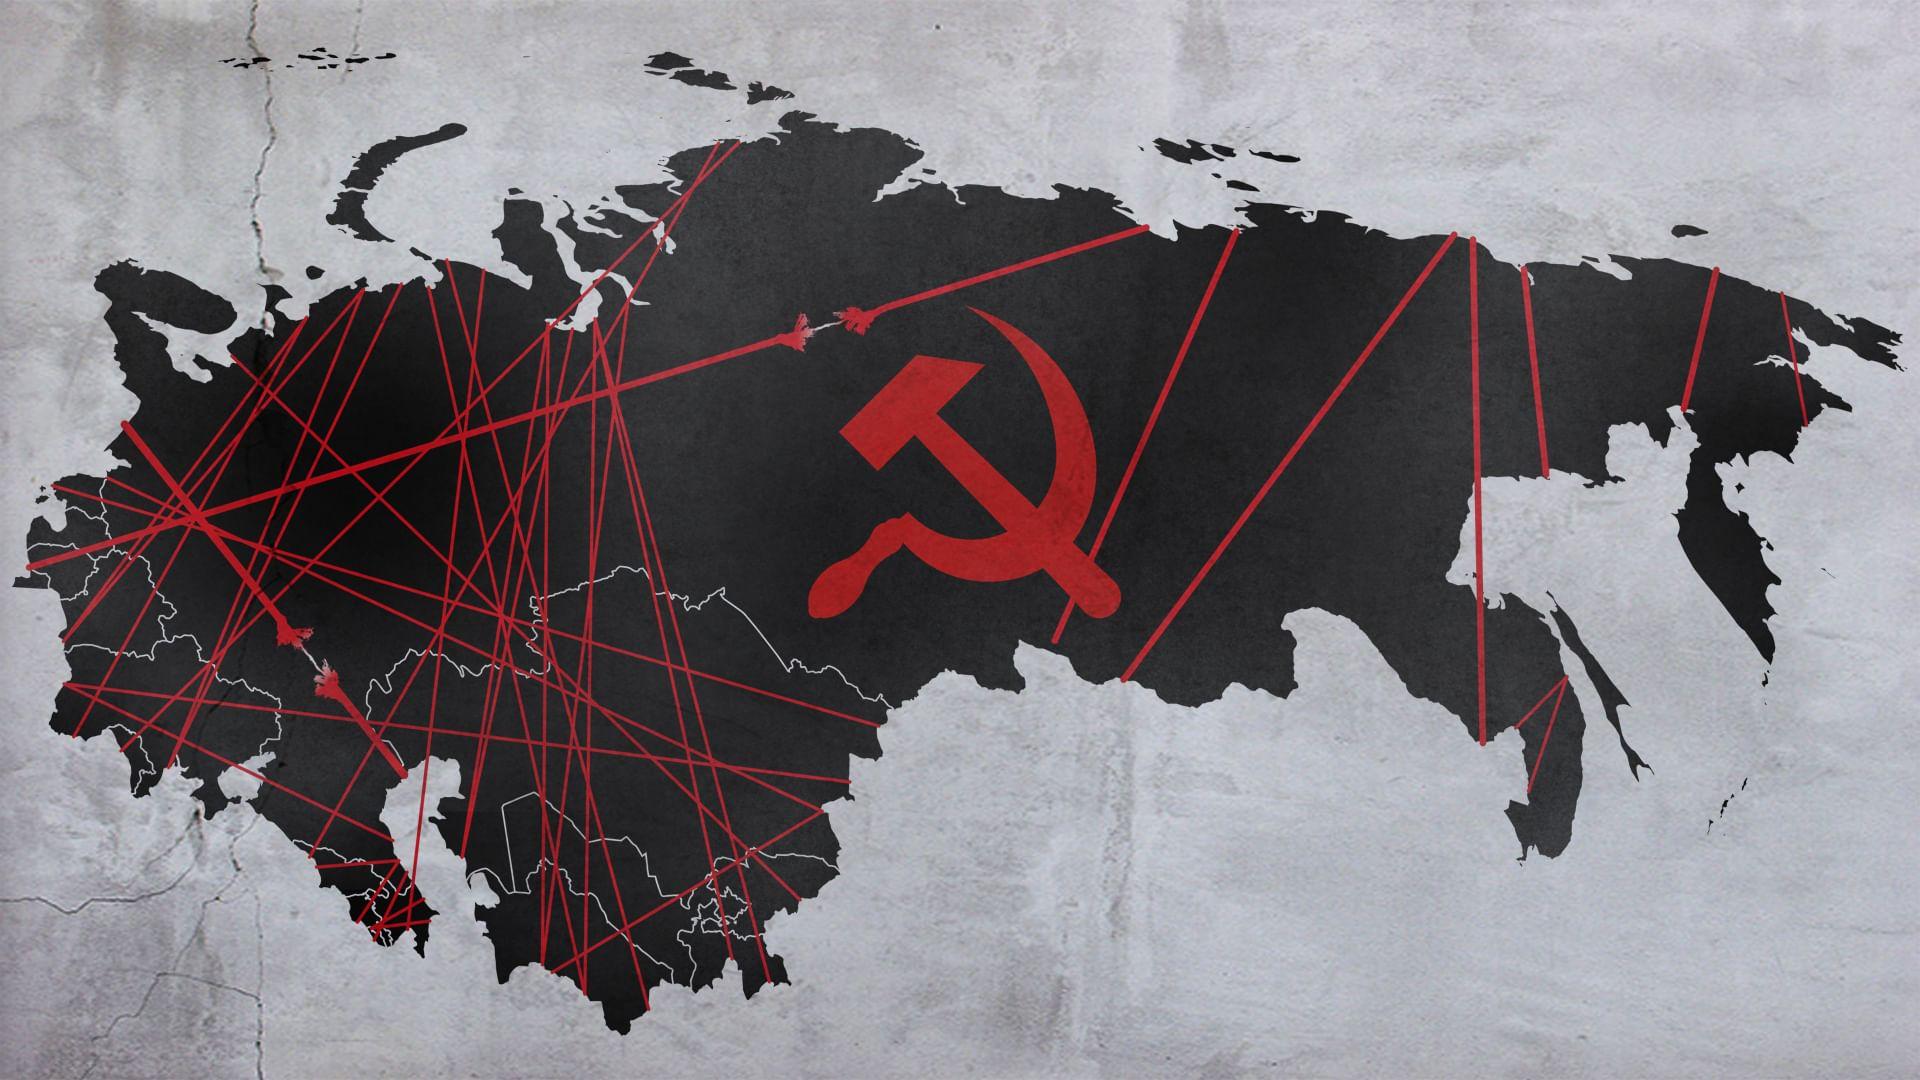 Les 30 ans de la fin de l'URSS